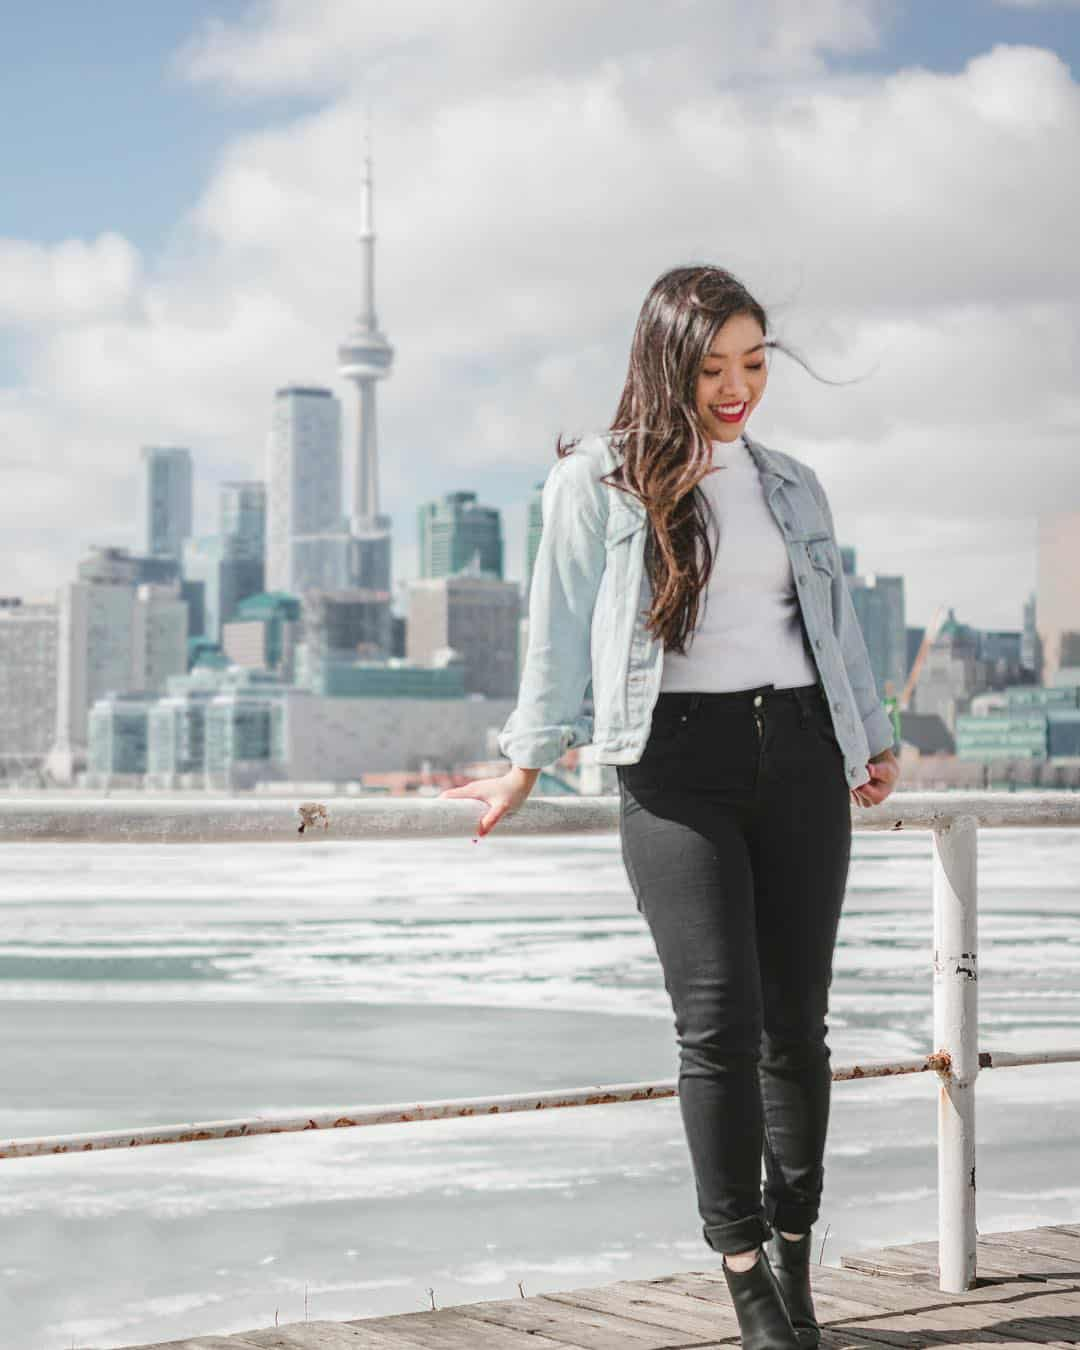 Polson Pier in Toronto, Canada